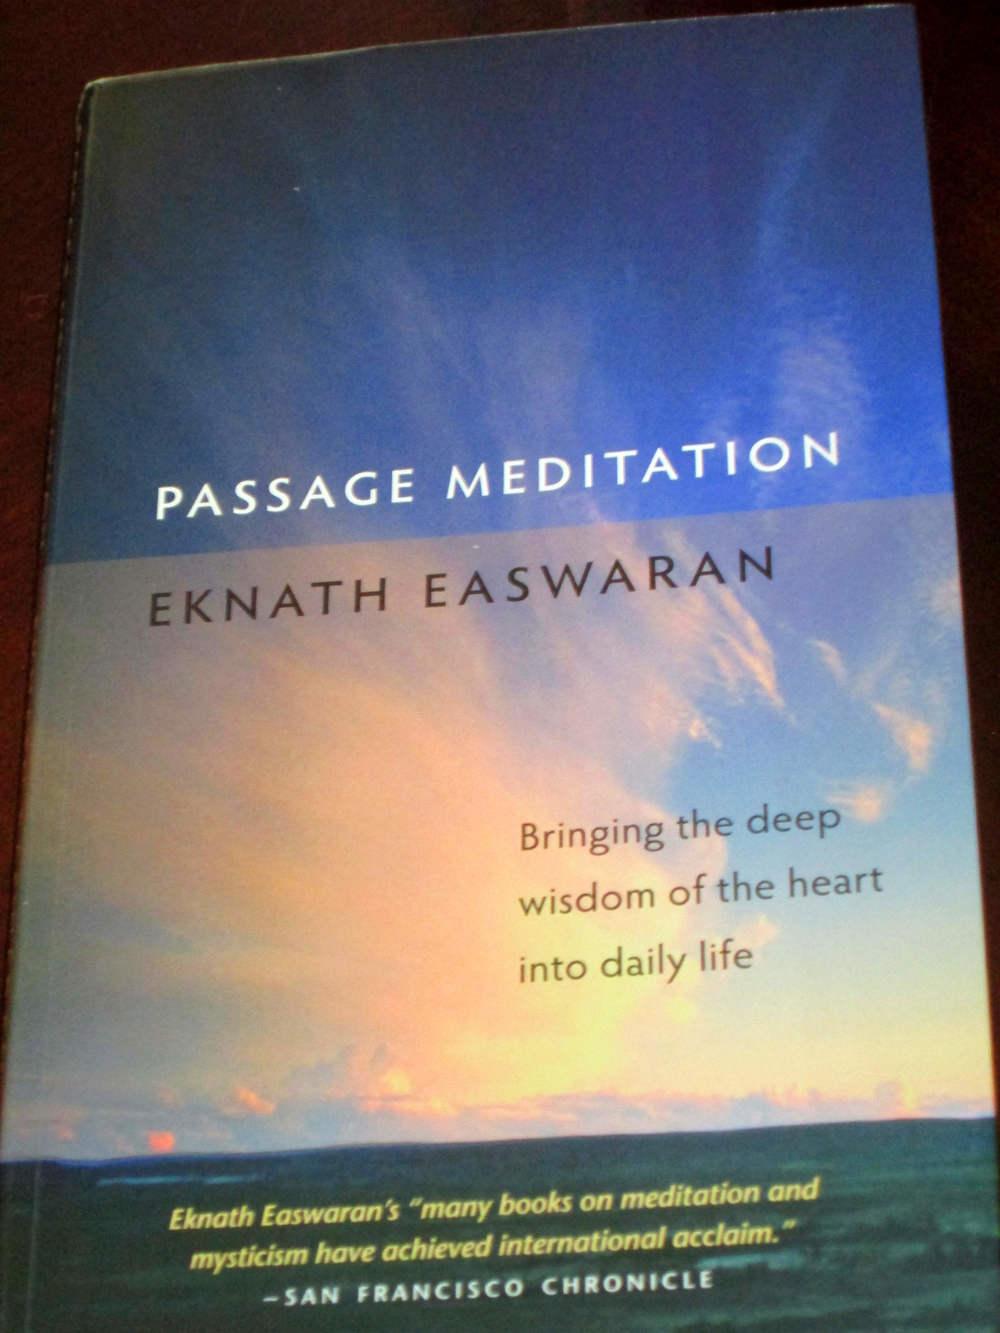 Easwaran-Passage-Meditation.jpg